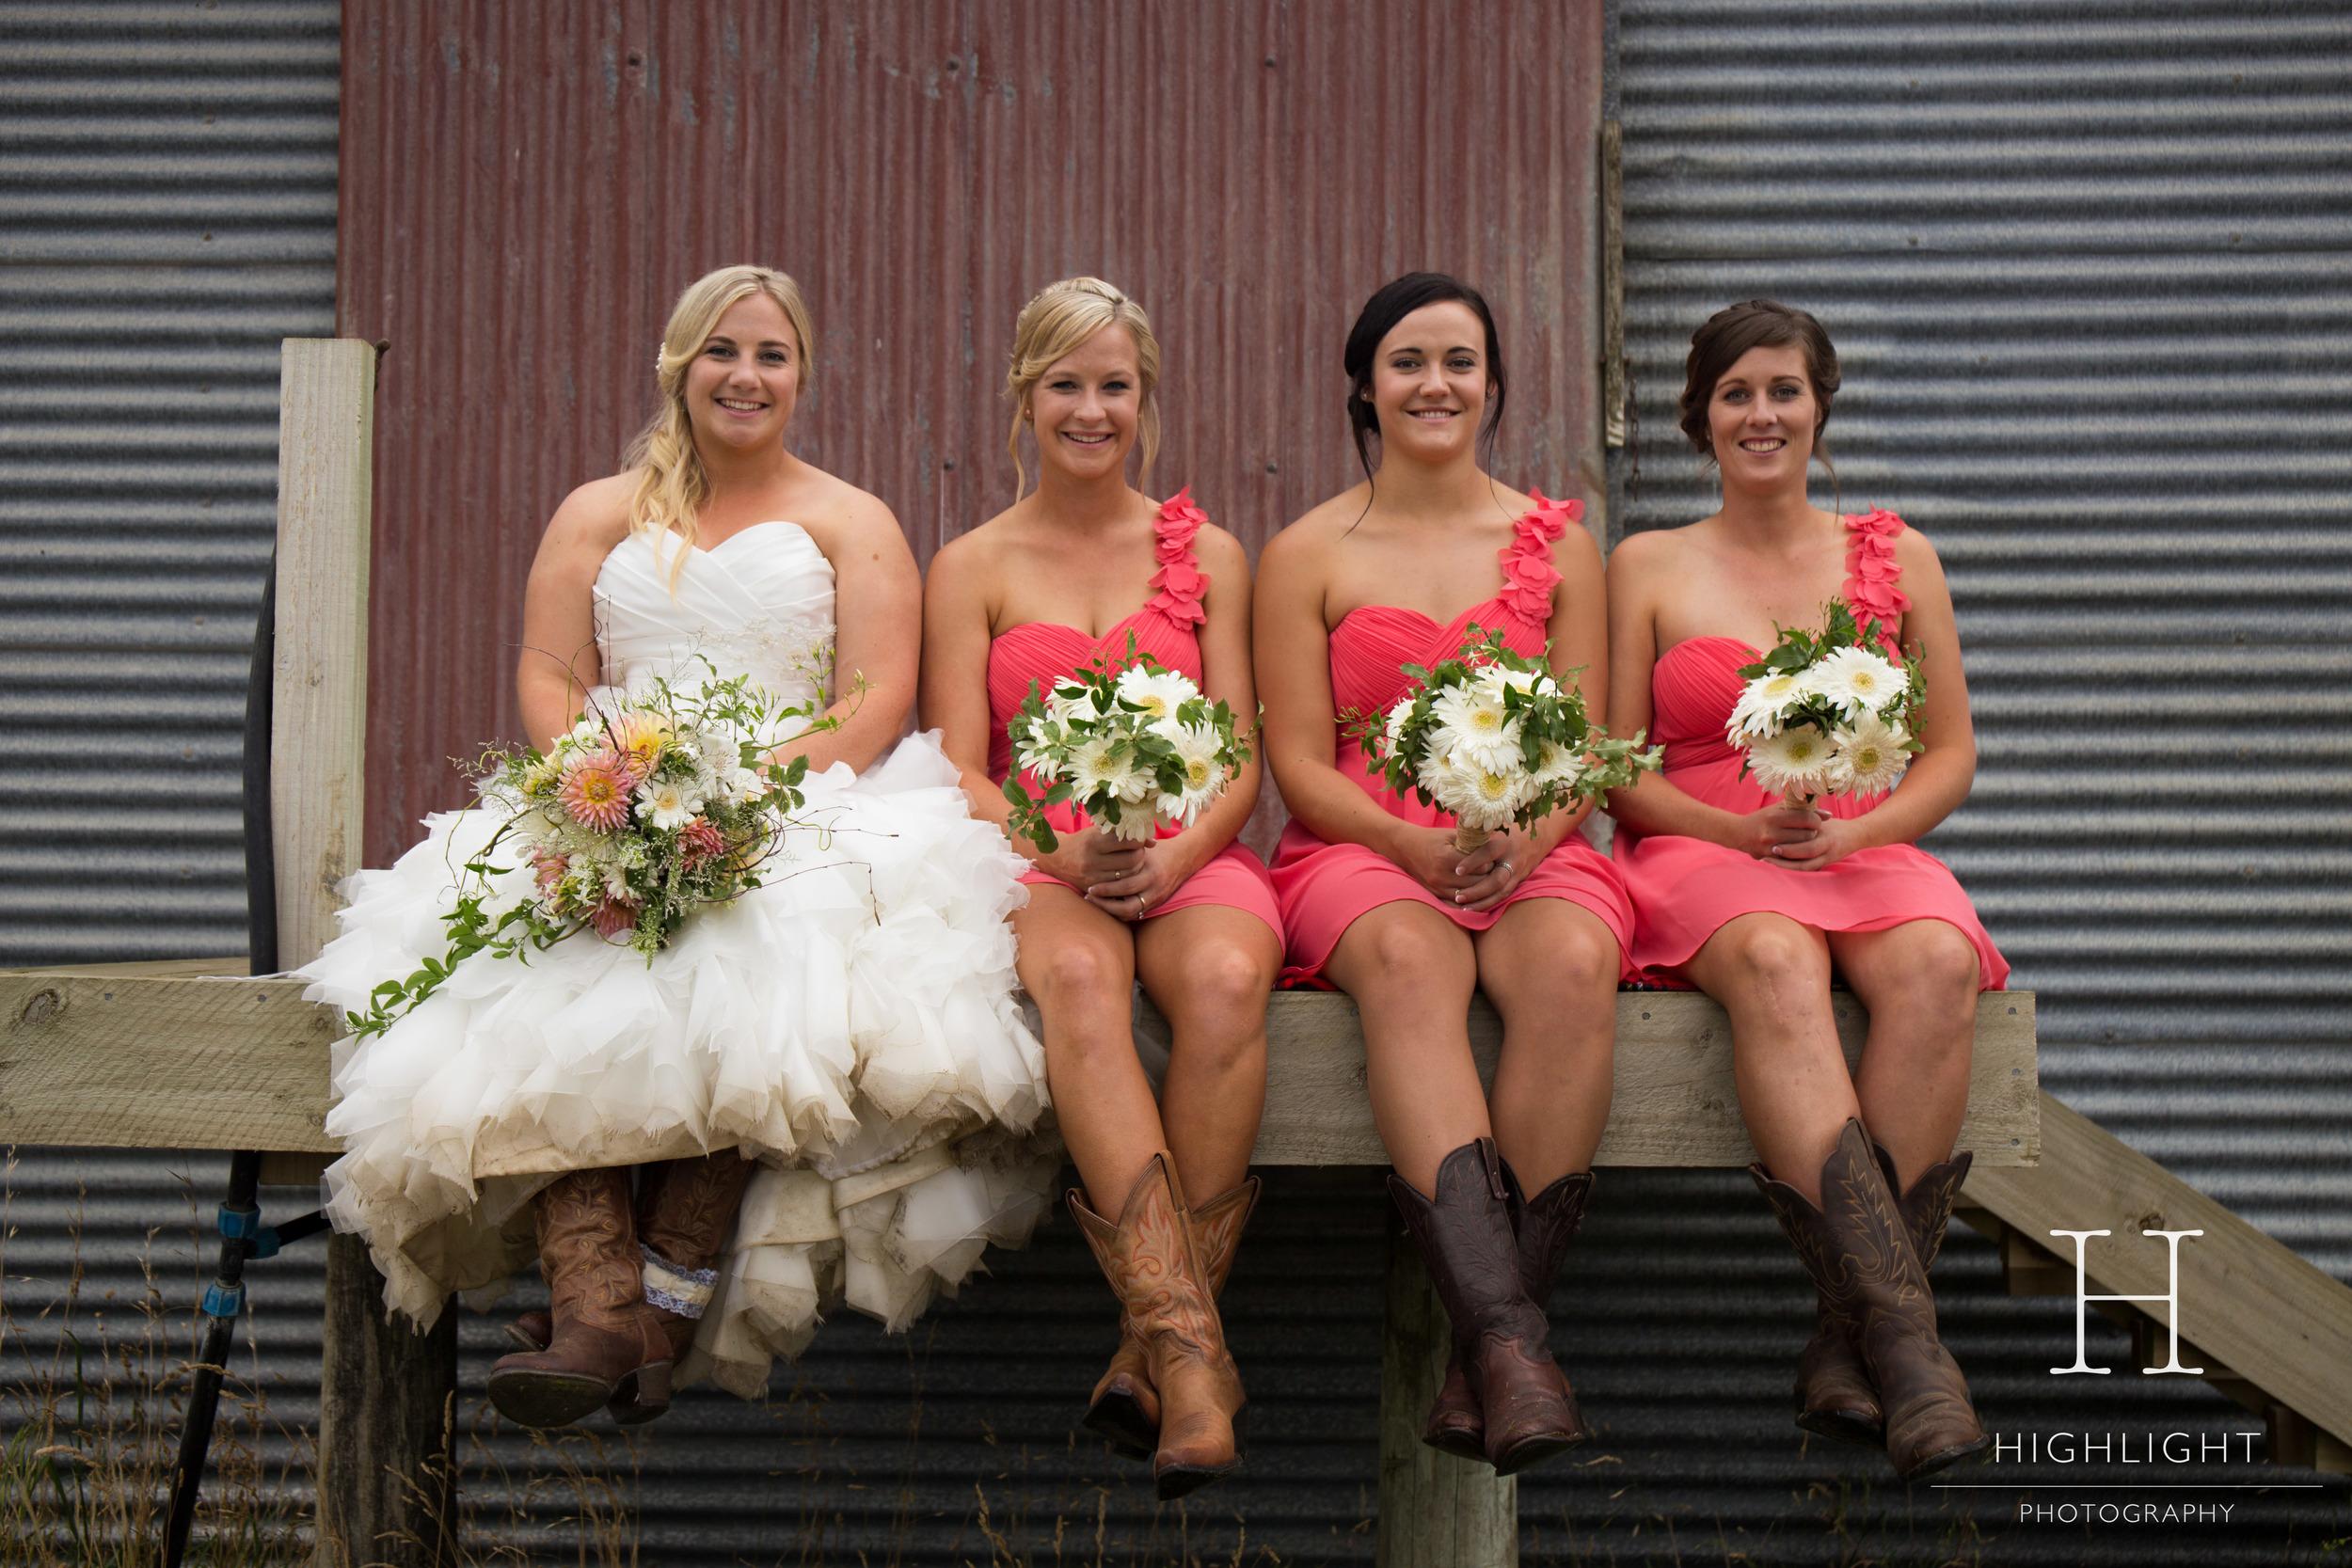 highlight_photography_wedding_new_zealand_group.jpg